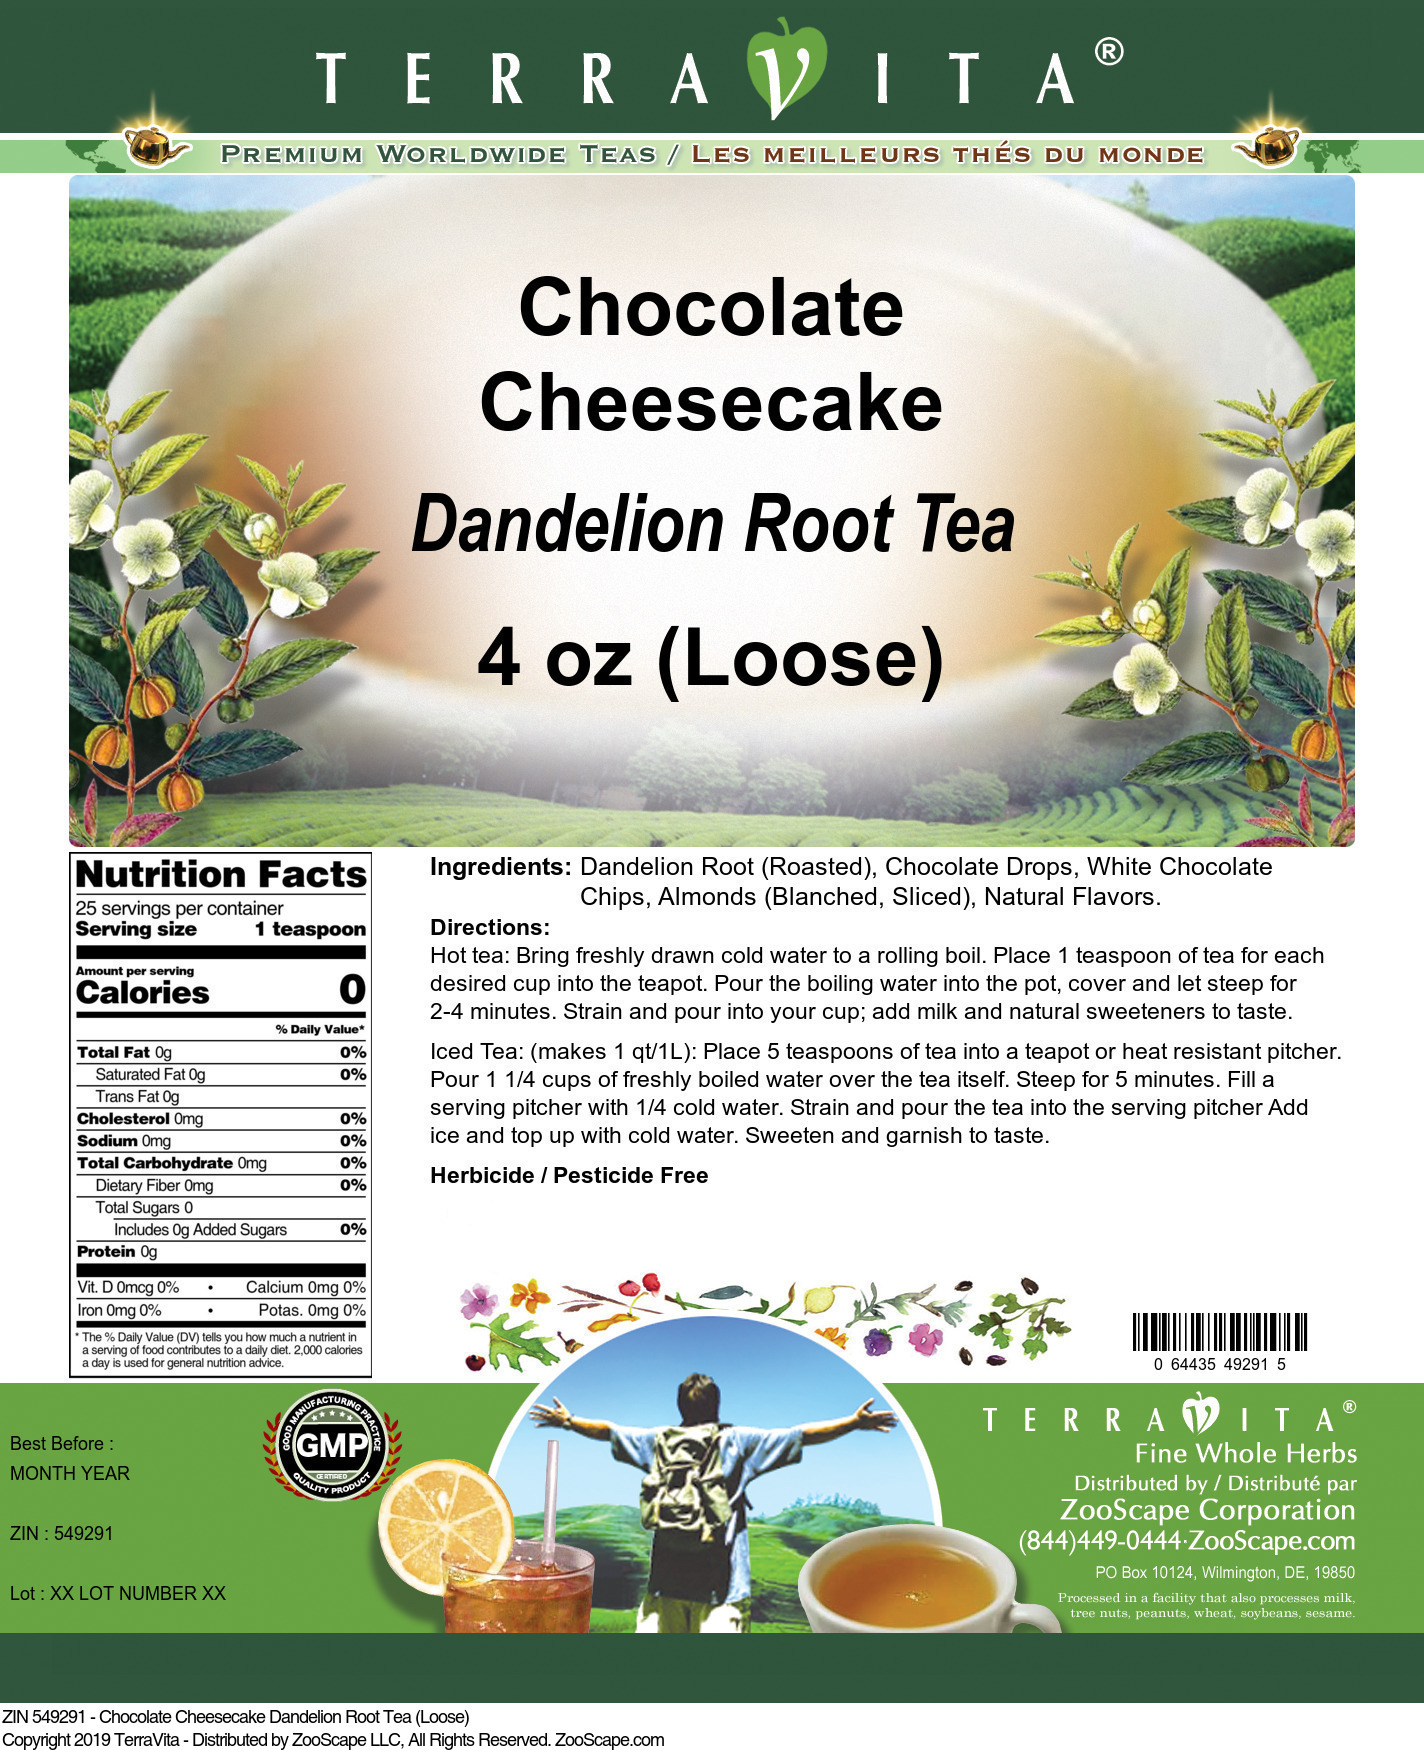 Chocolate Cheesecake Dandelion Root